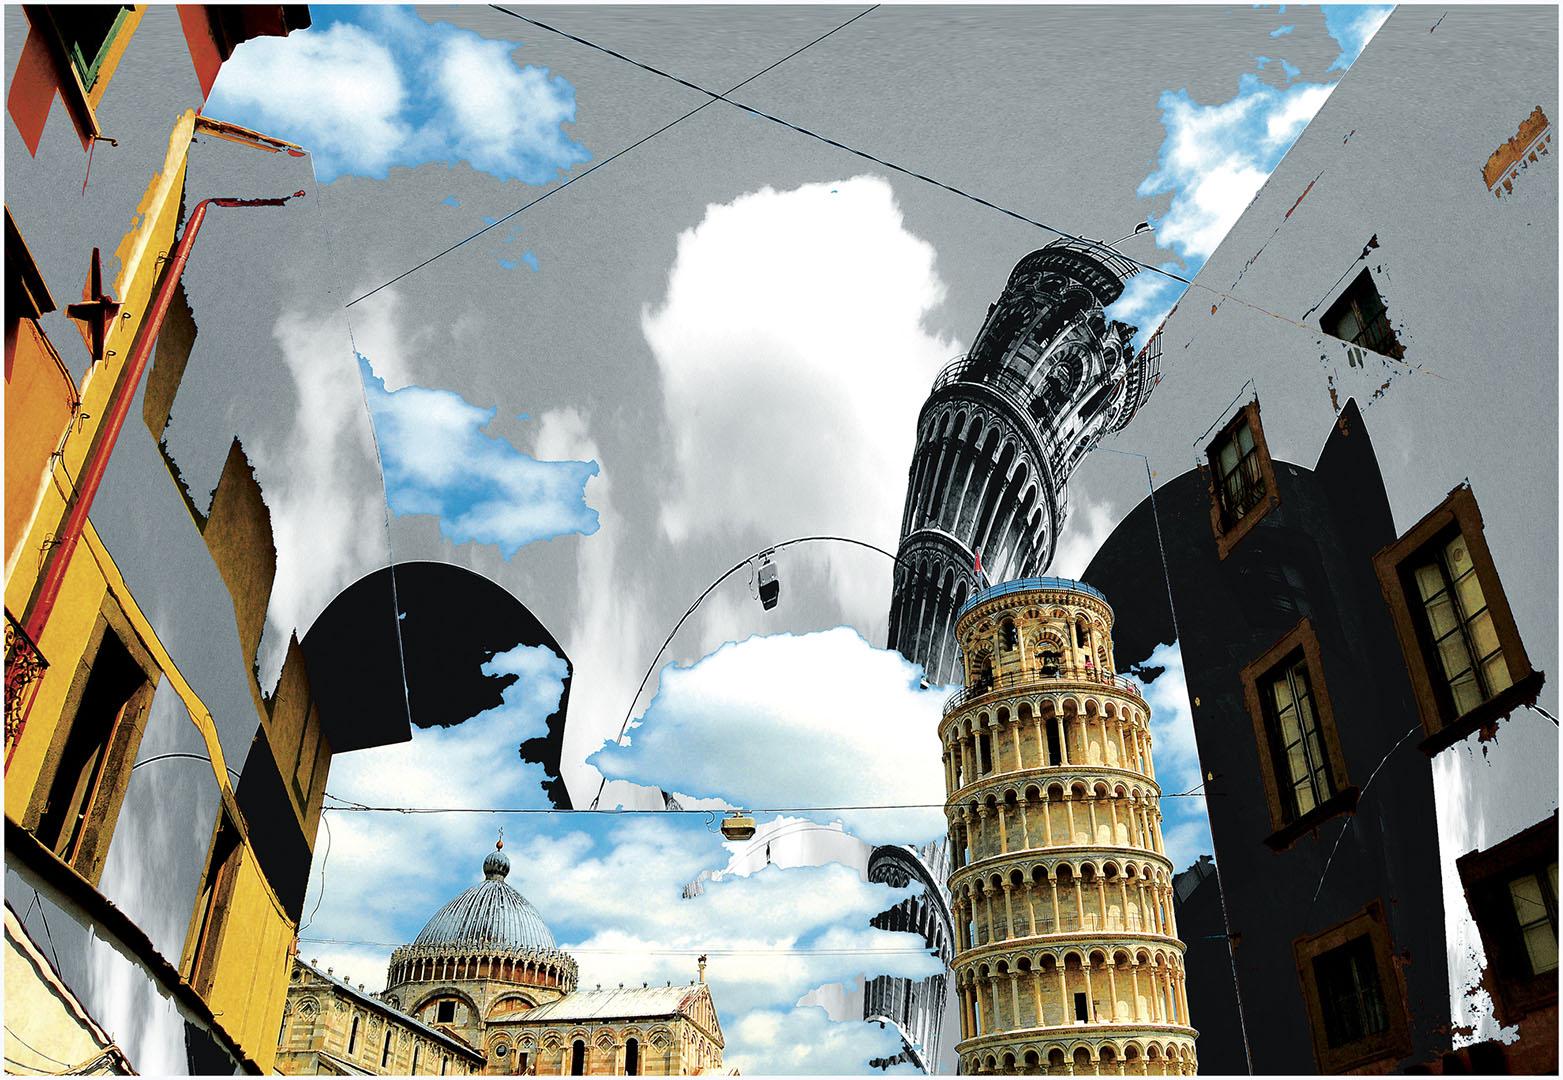 Pisa-Piazza_dei_Miracoli_081_I11.1-87